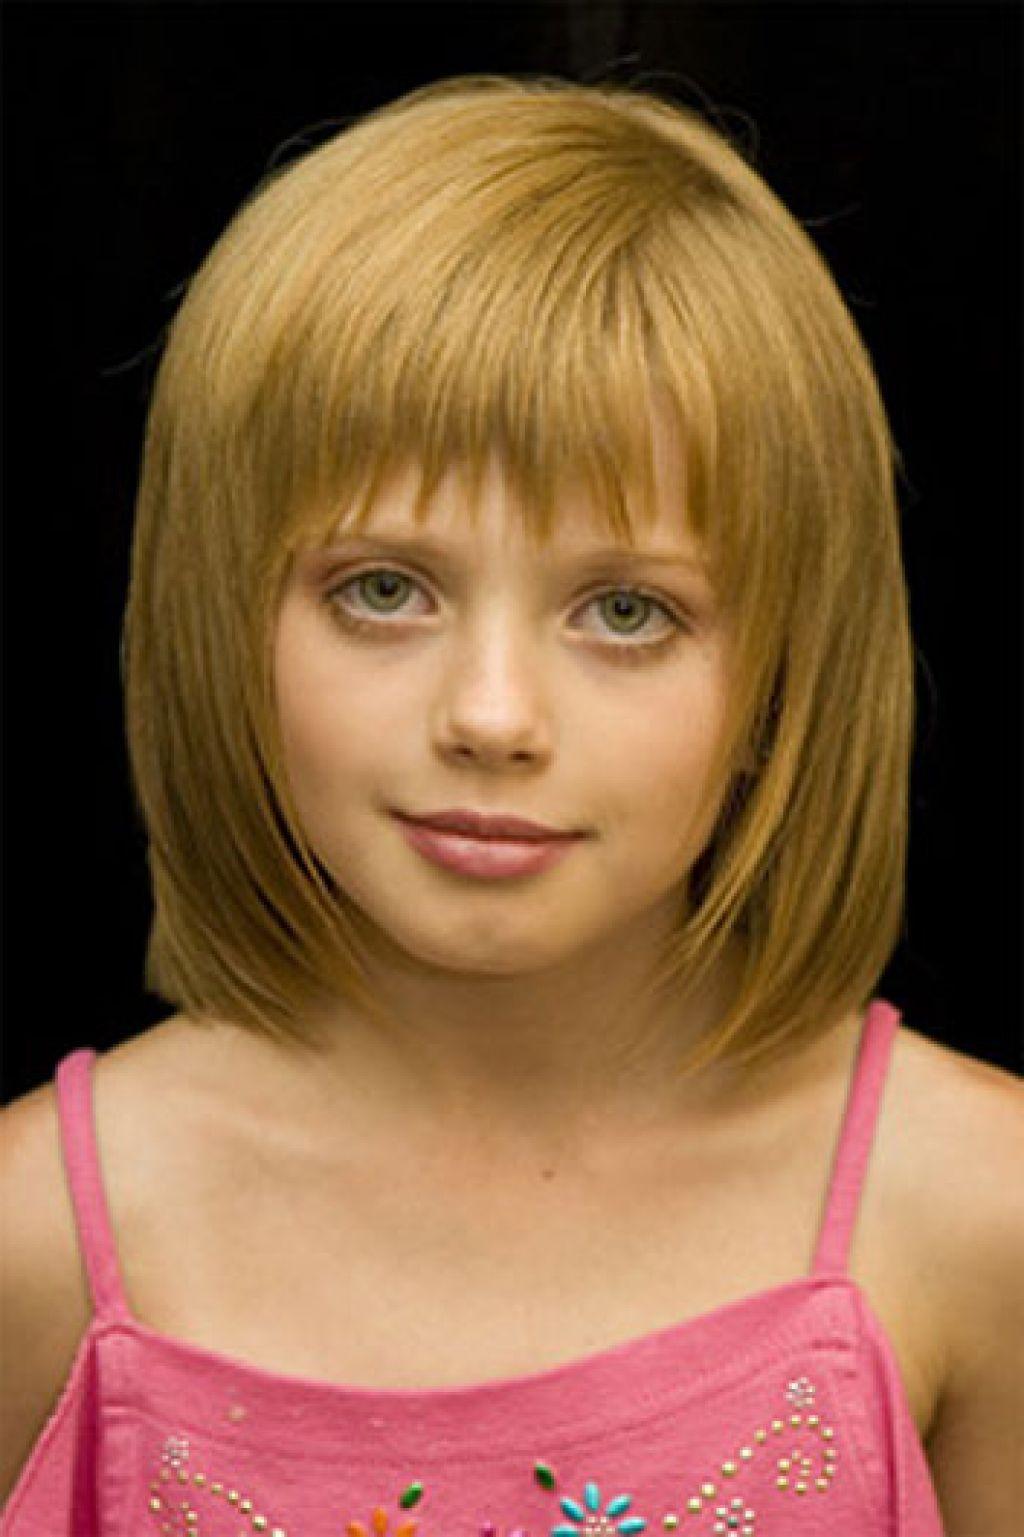 kids haircut girl - google search | hair | pinterest